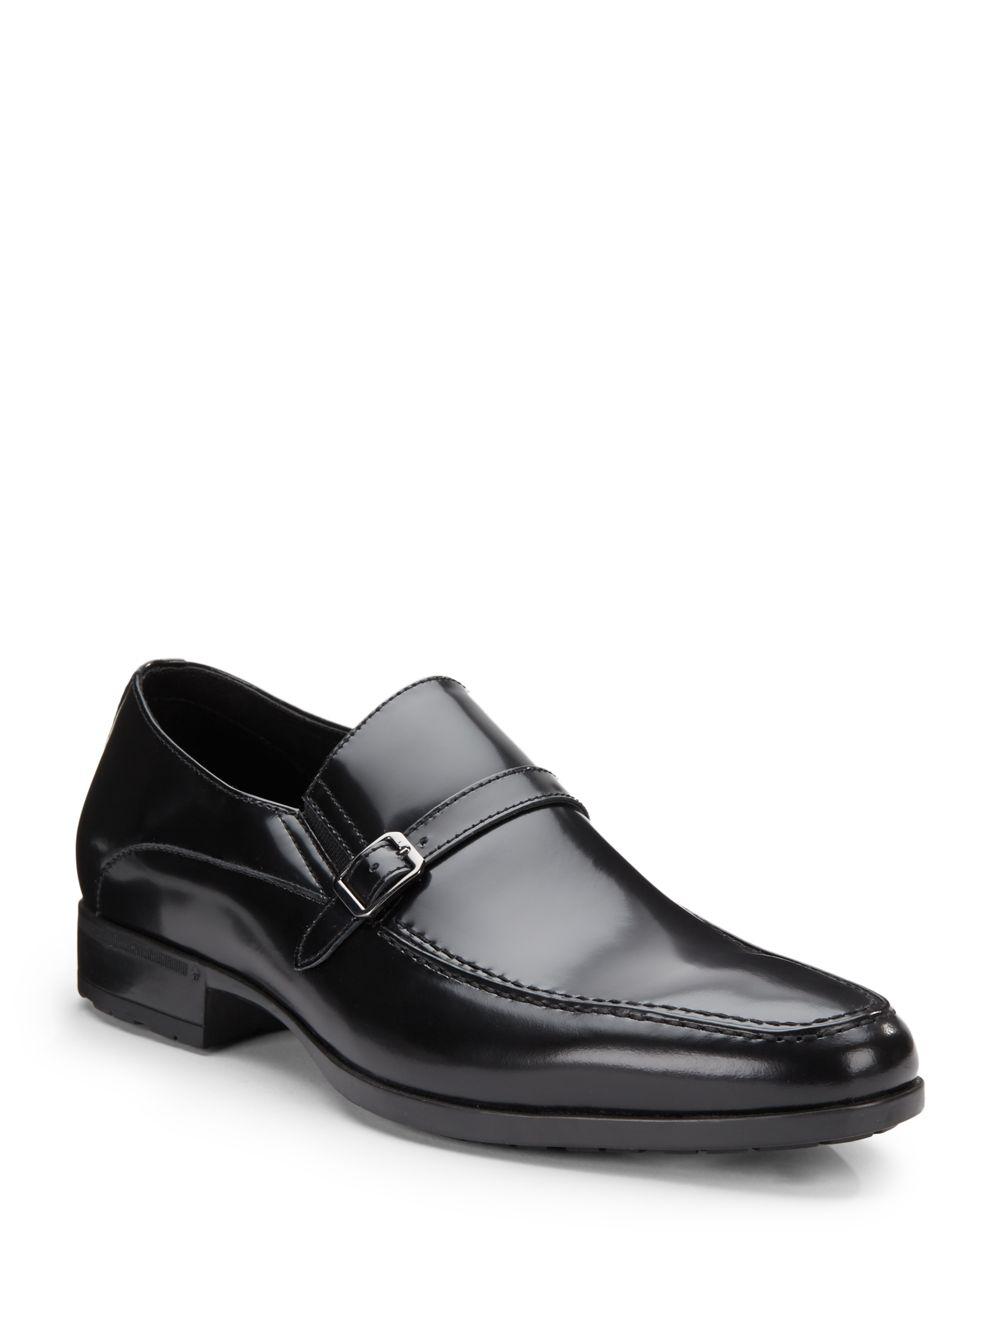 Lyst Saks Fifth Avenue Tobin Buckle Strap Leather